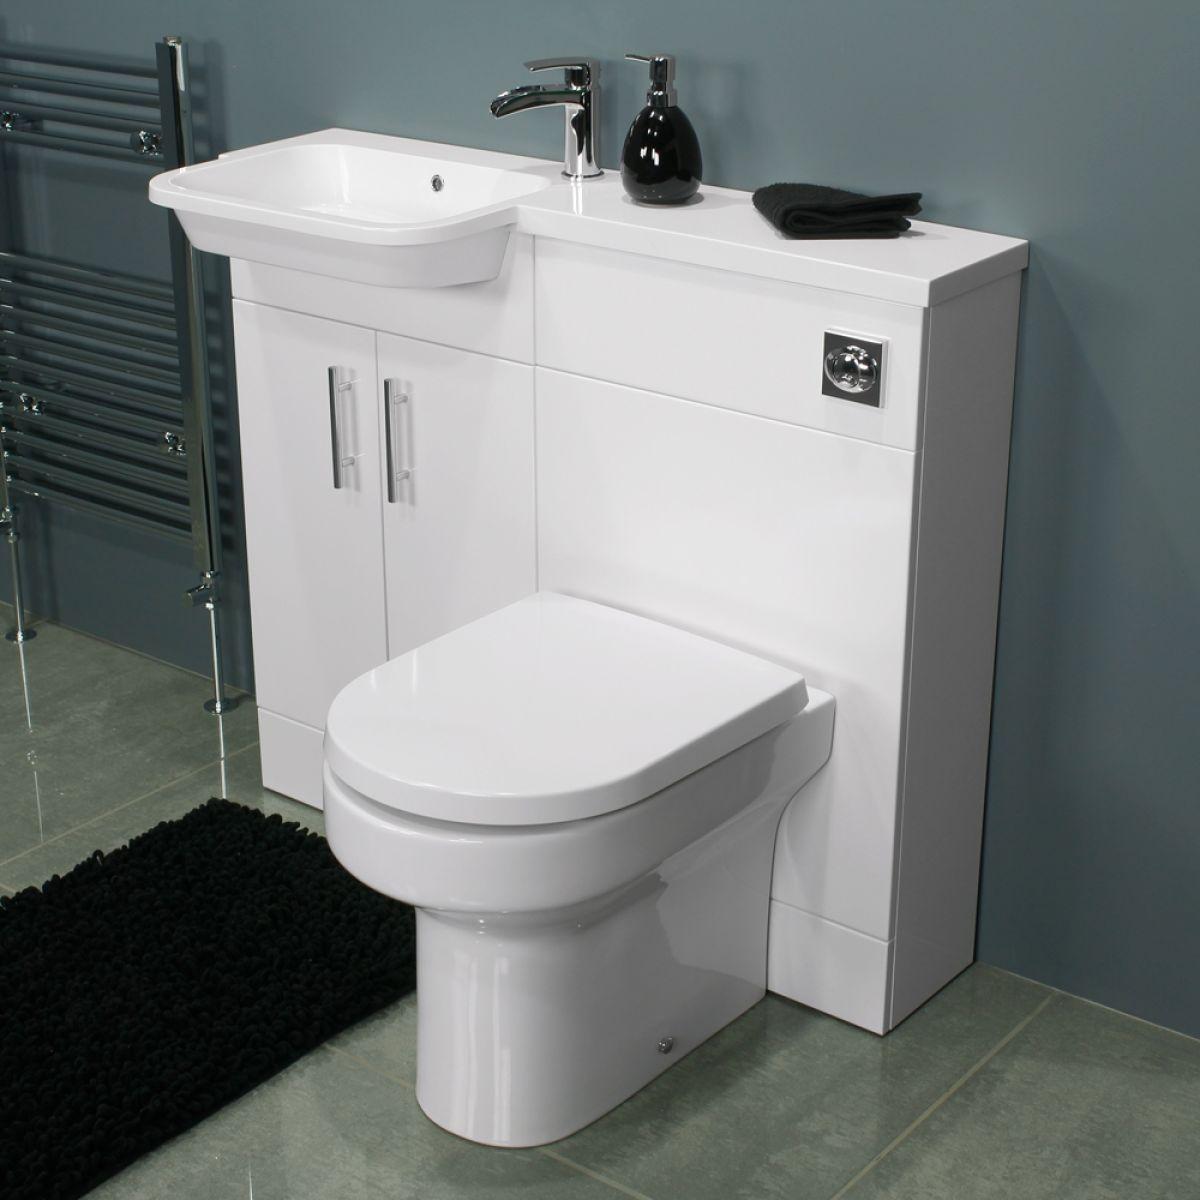 Cassellie Ria Gloss White L-Shape Combination Furniture Pack